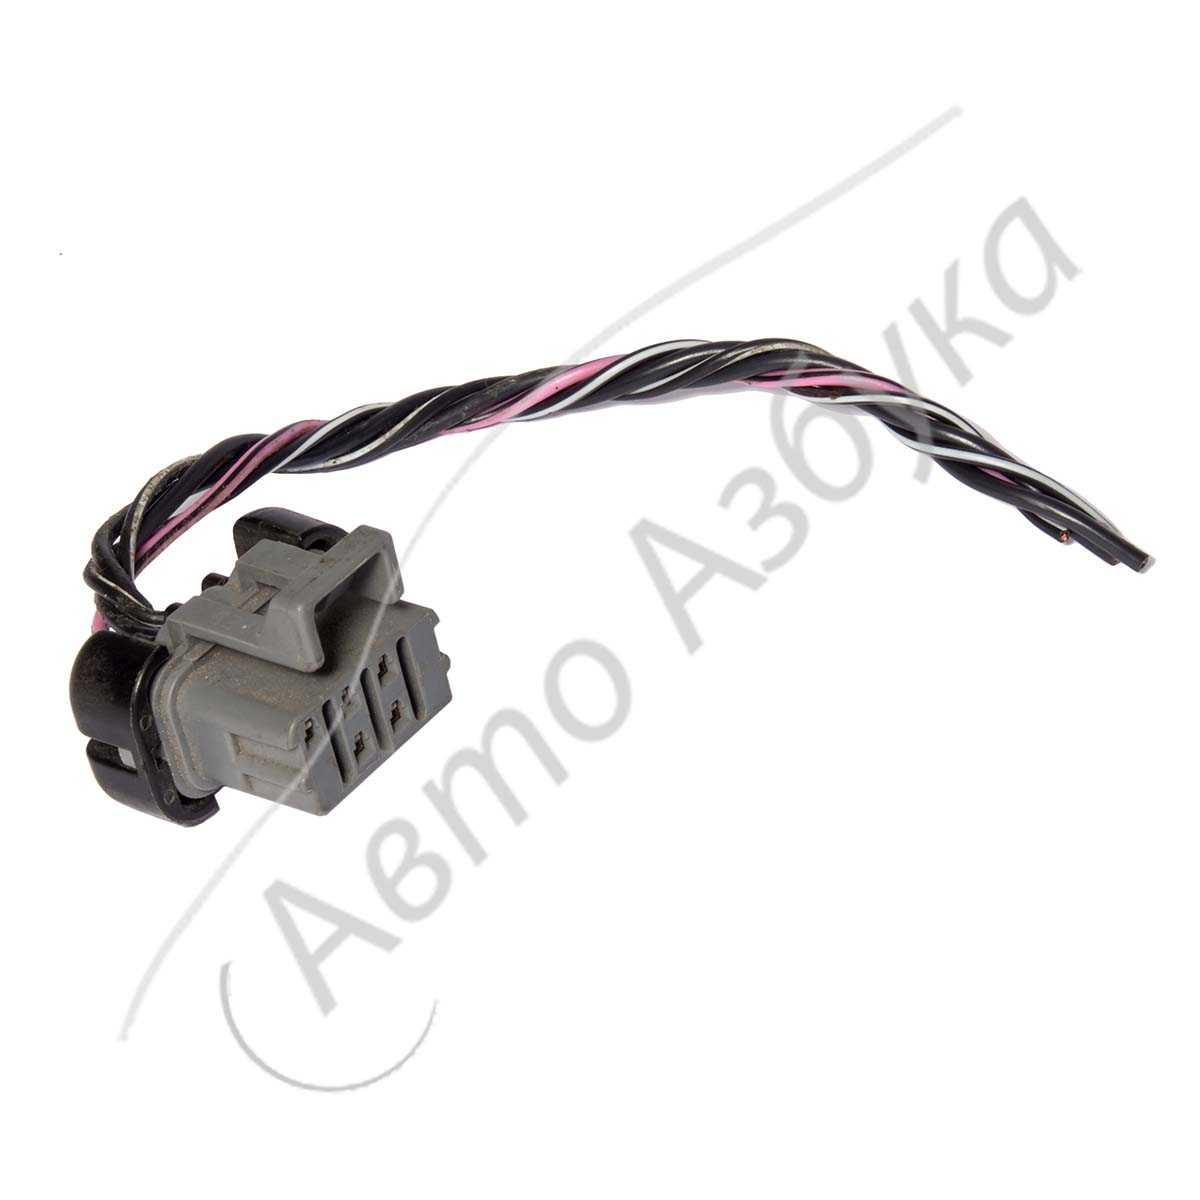 Проверка и замена форсунок на автомобиле Лада Приора ВАЗ 2170